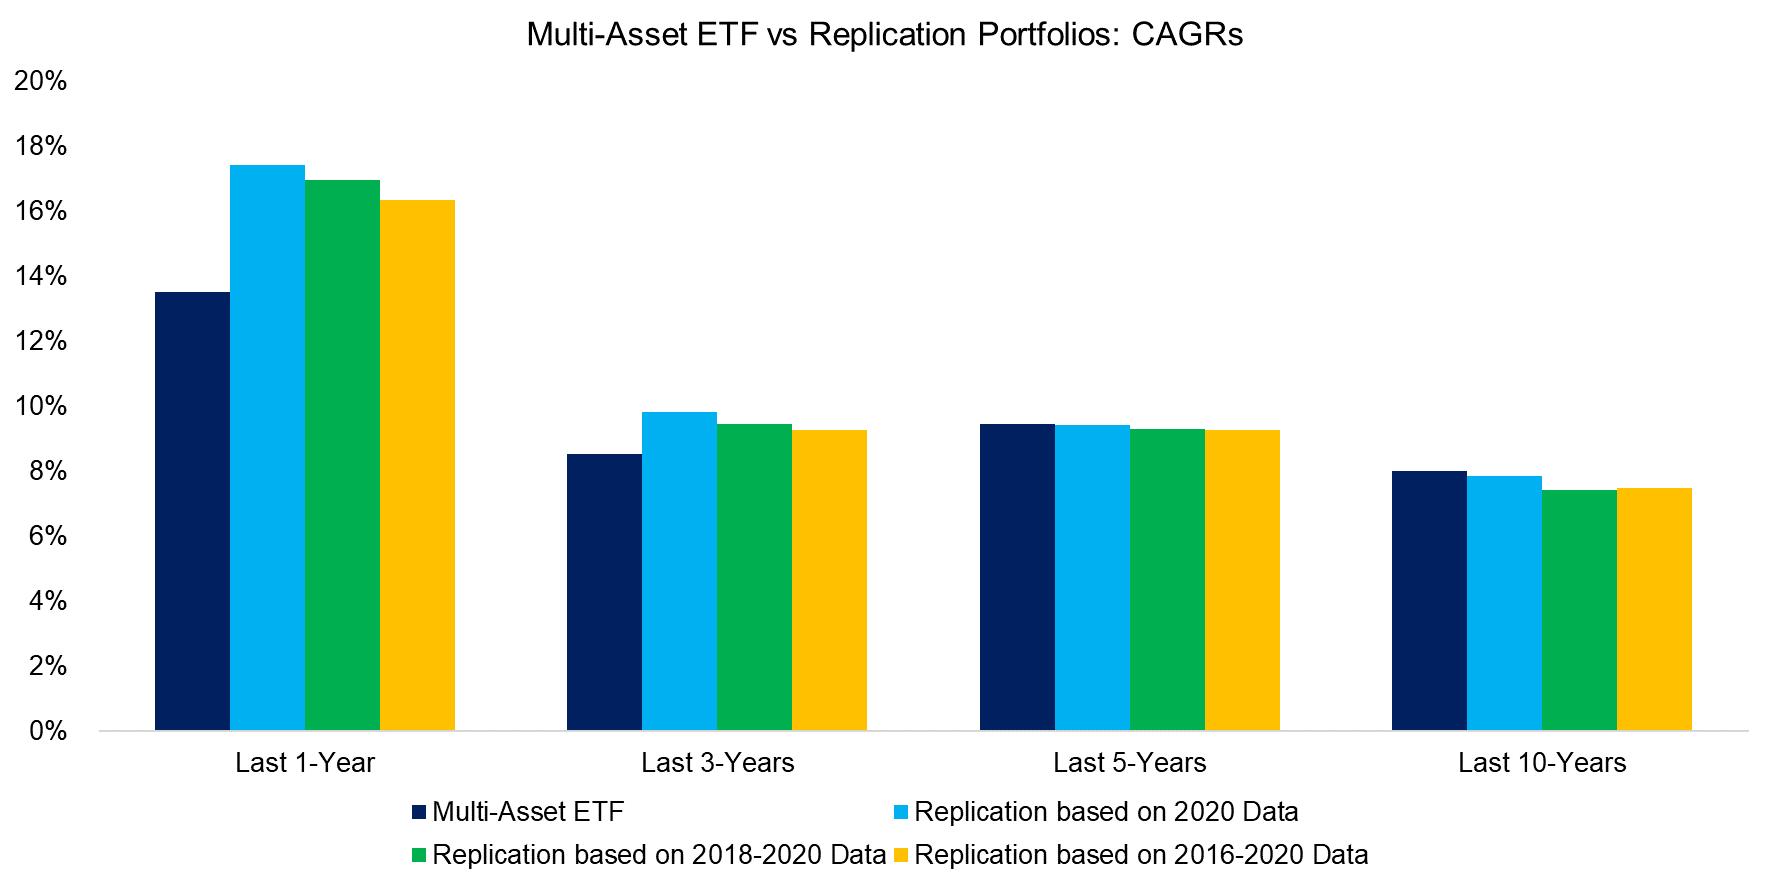 Multi-Asset ETF vs Replication Portfolios CAGRs